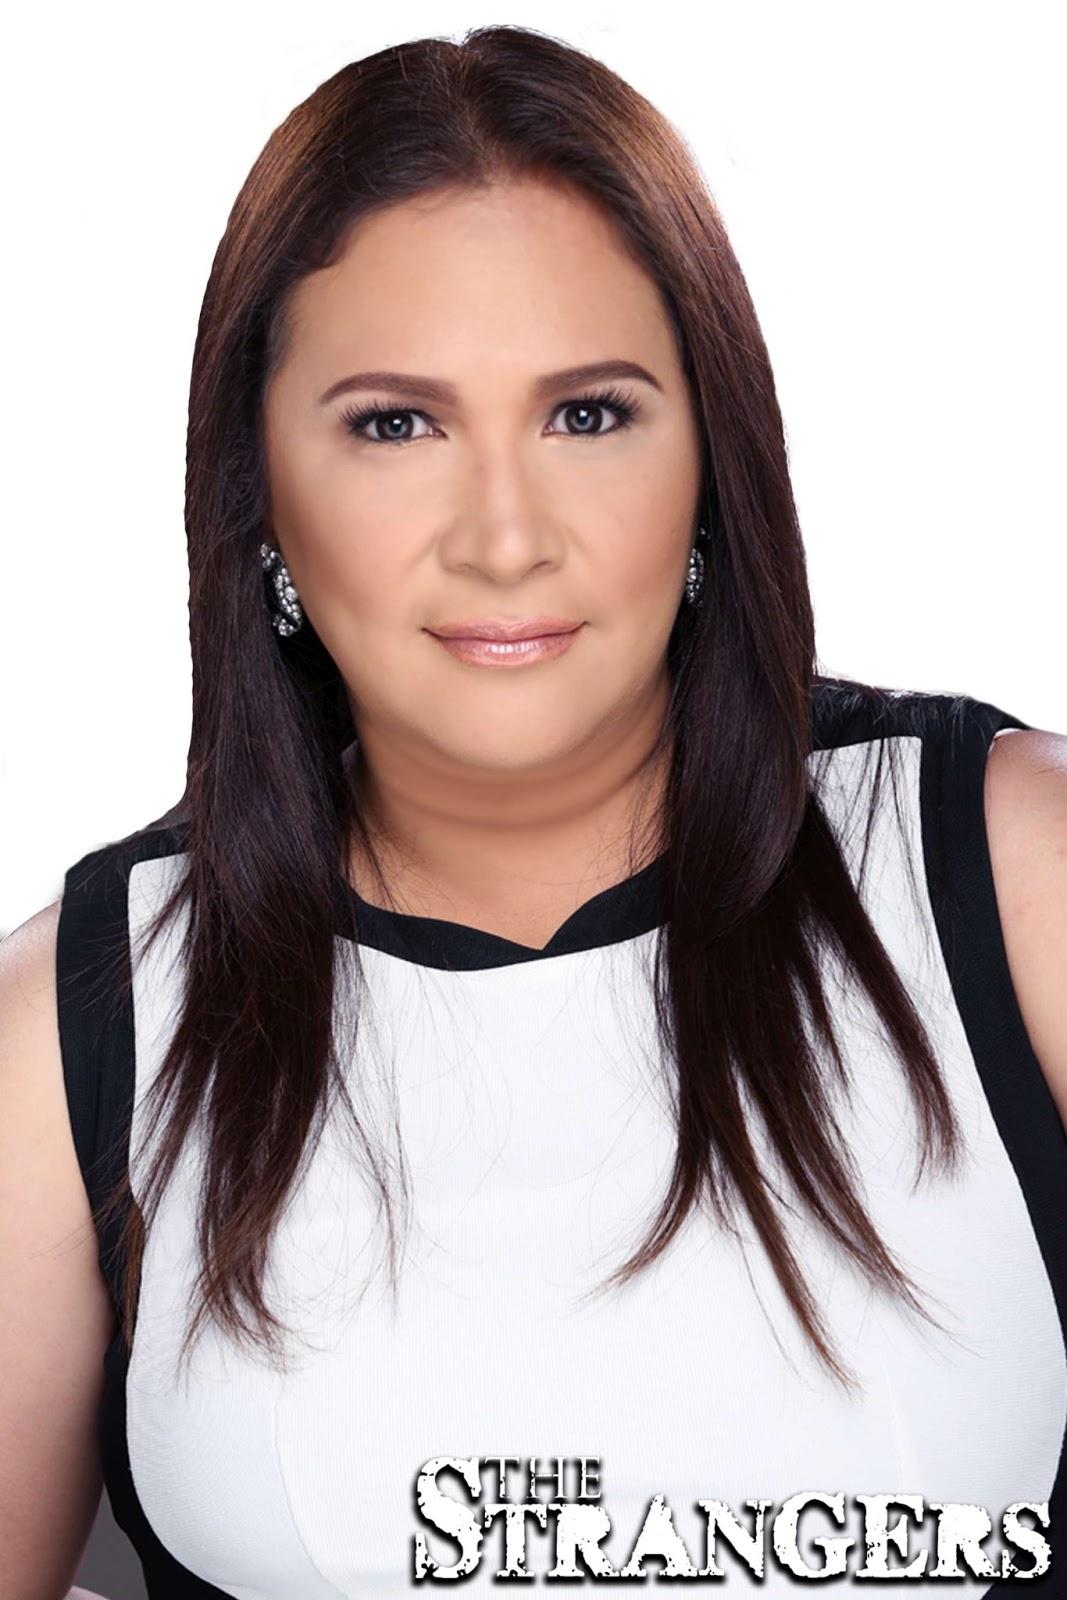 Catherine Janice Yap de Belen Net Worth